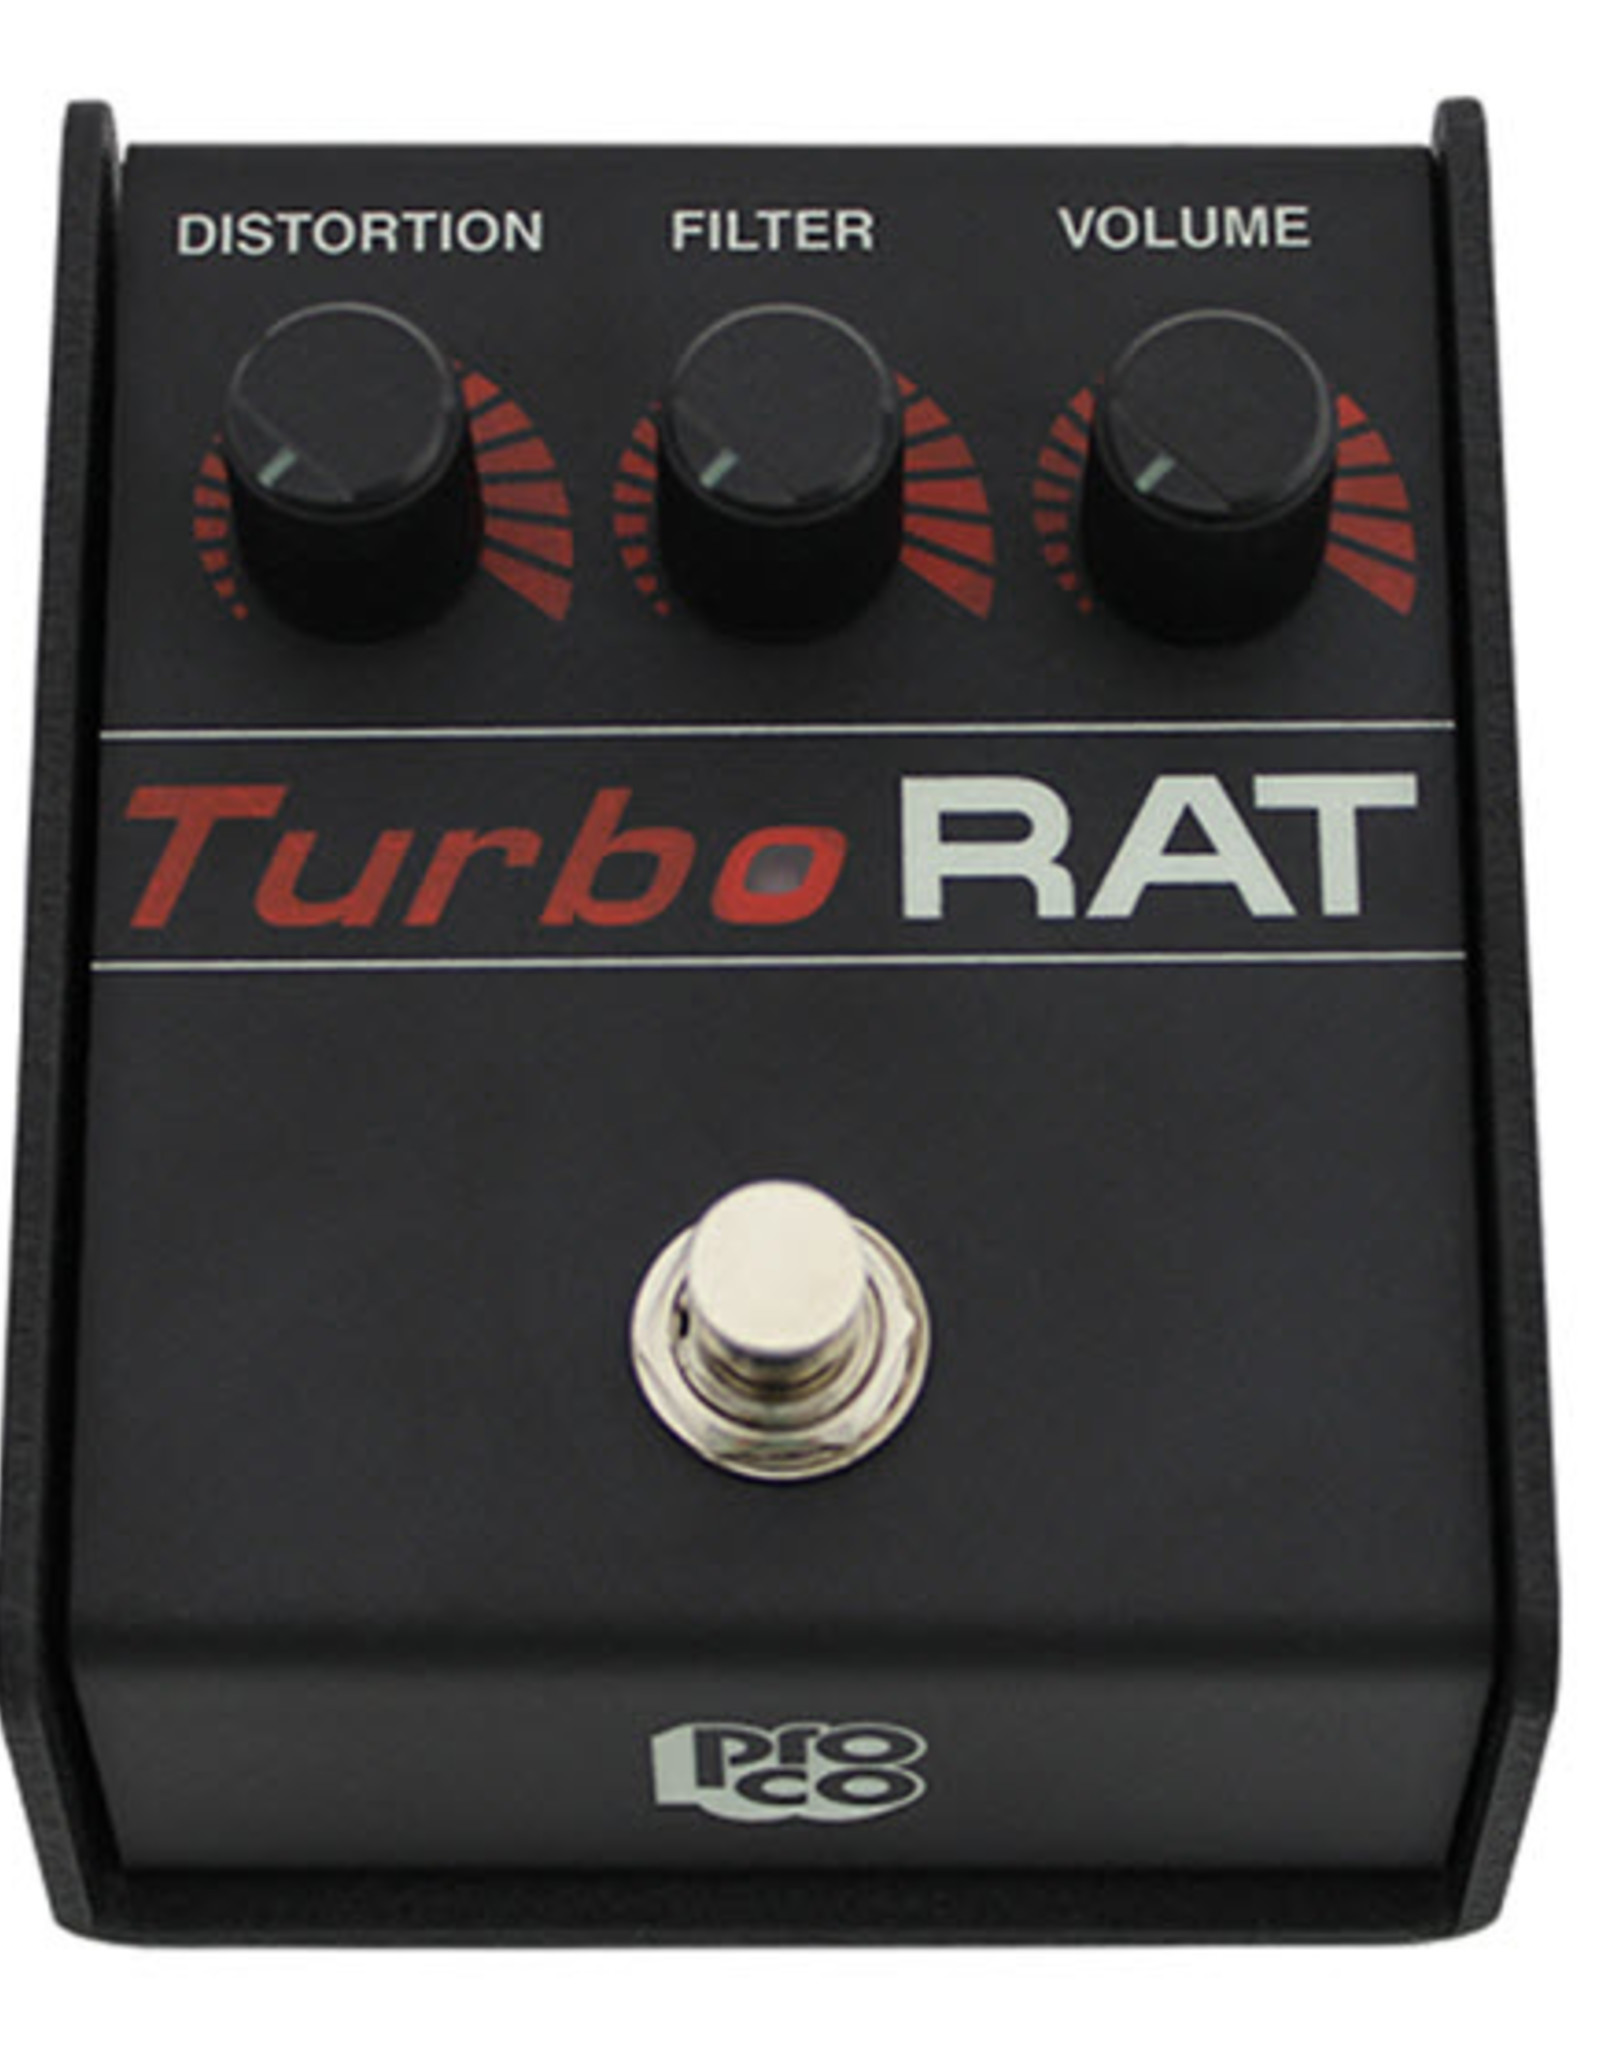 RAT TURBORAT Distortion Pedal